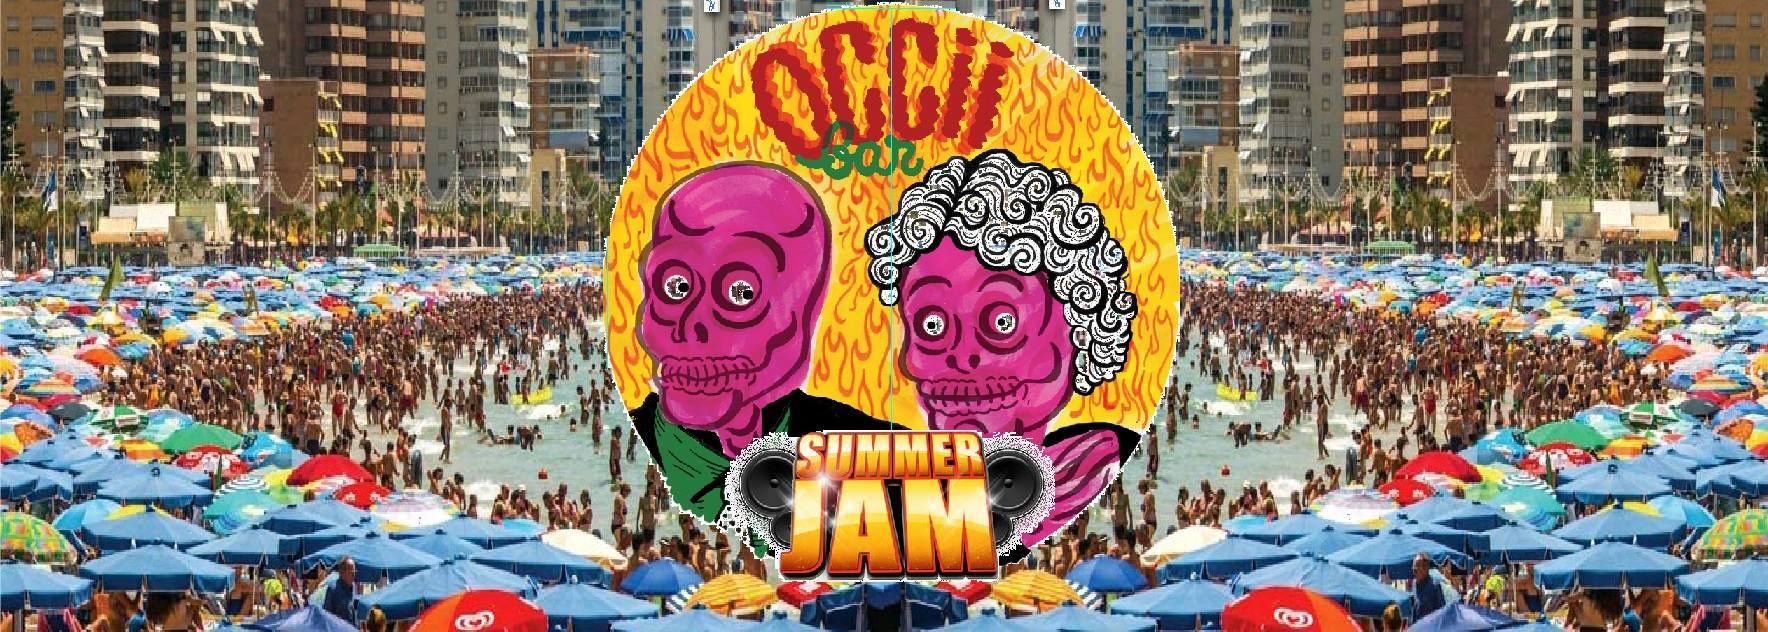 OCCII BAR - SUMMER JAM w/ DJ VROOM & DREESMAN + DJ SNOODAARD + DJ SL'OCCII + MB GIJS BORSTLAB + DJ HAKKI TAKKI + DJ/VJ BARBAPAPPA (Kinderpret)